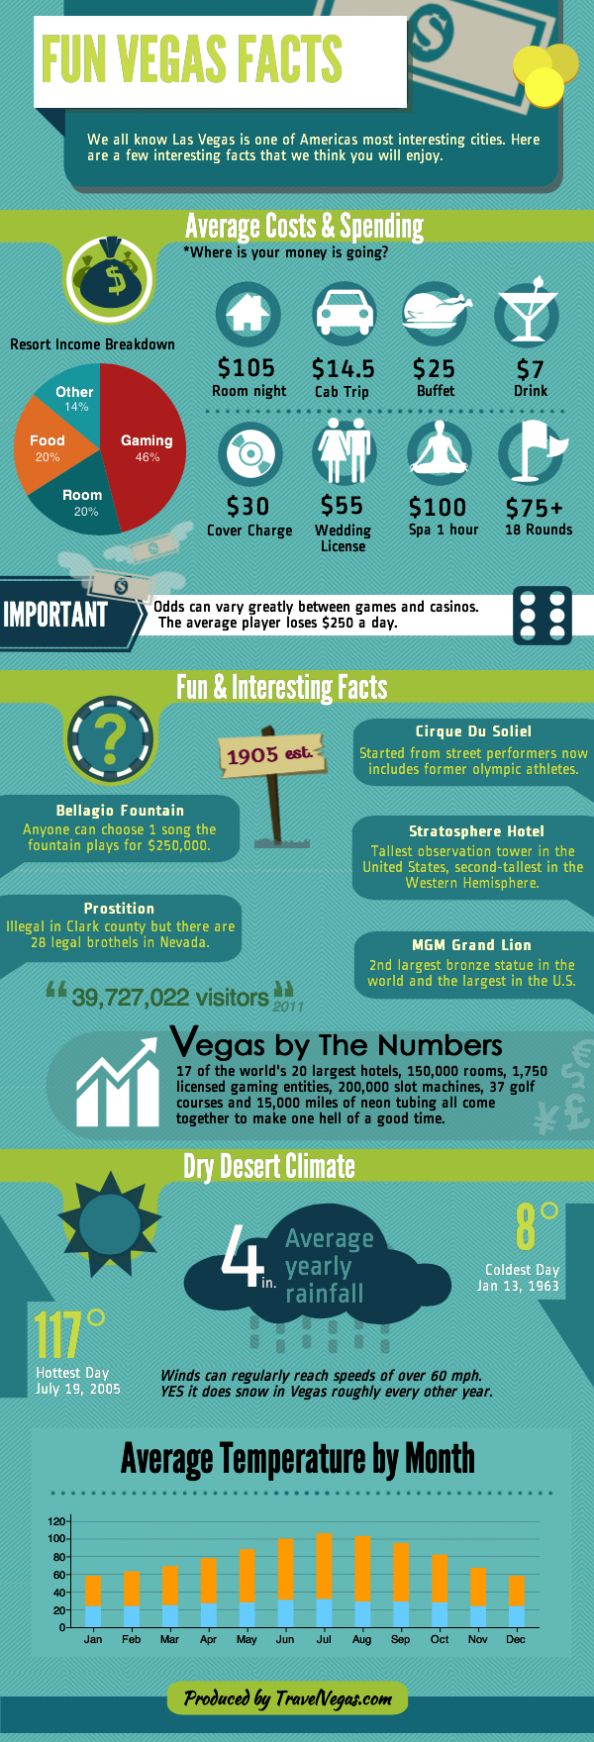 Fun Las Vegas Facts